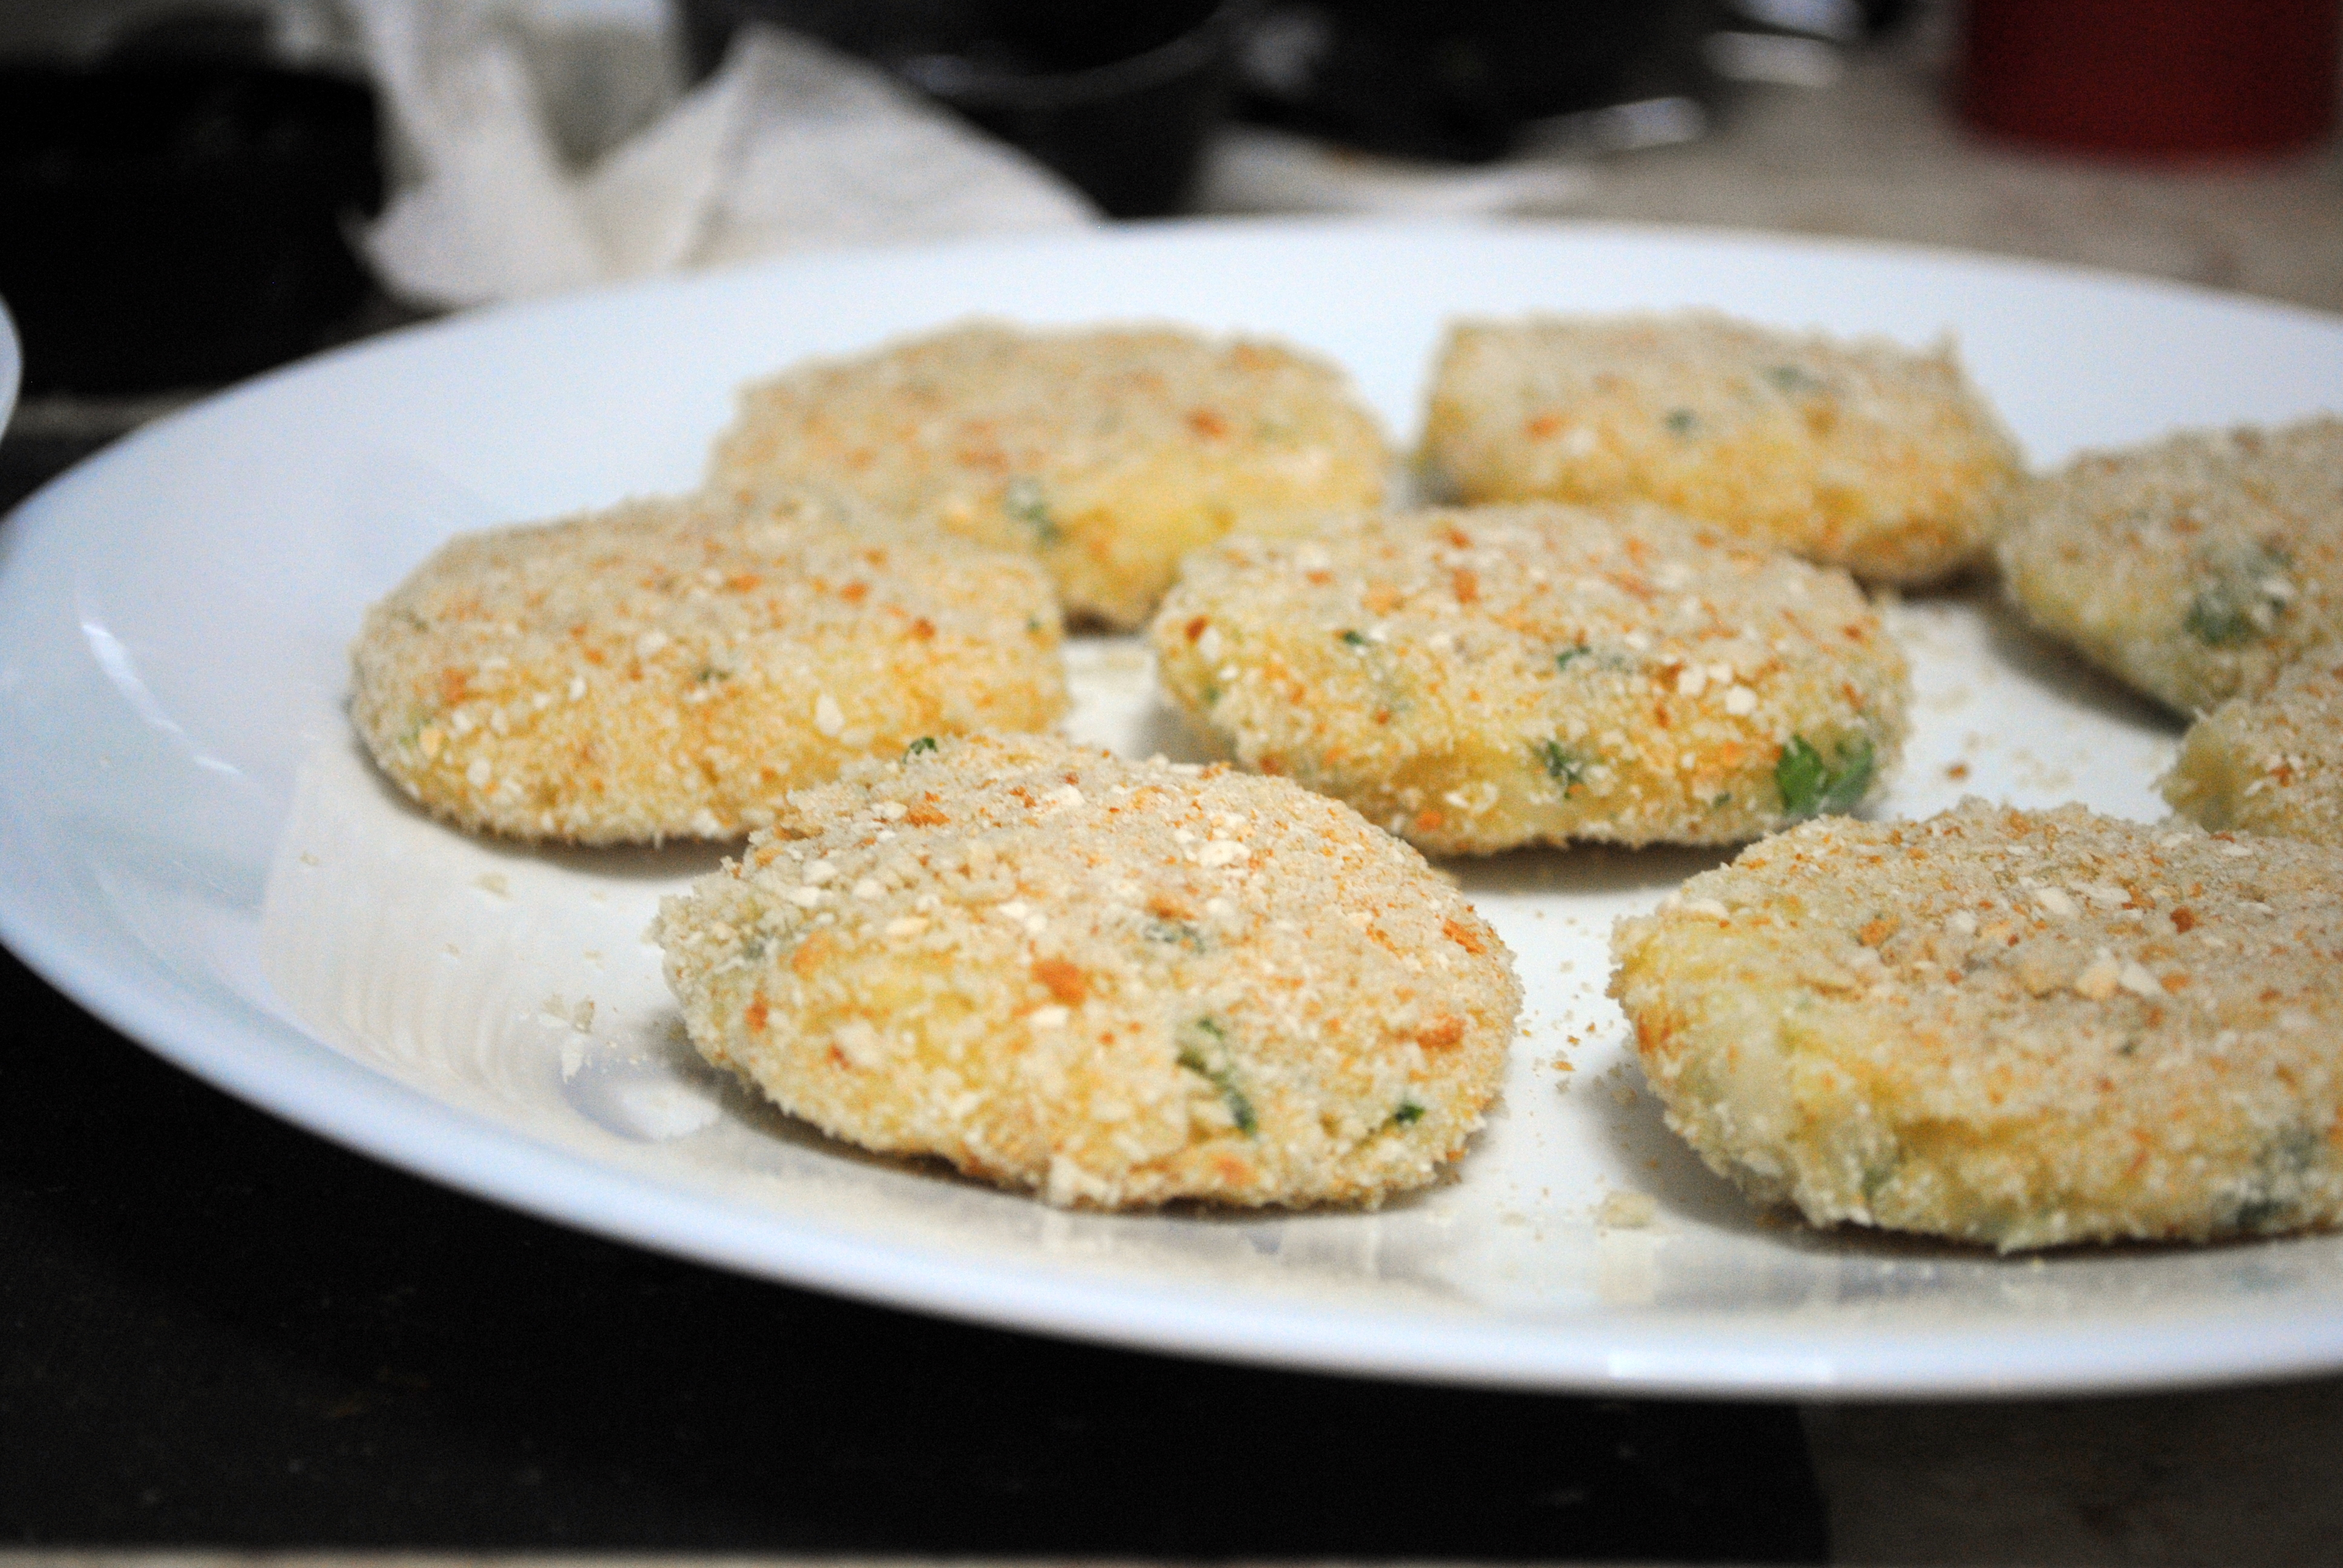 ... sweet corn pancakes orna ella s sweet potato pancakes recipe on food52